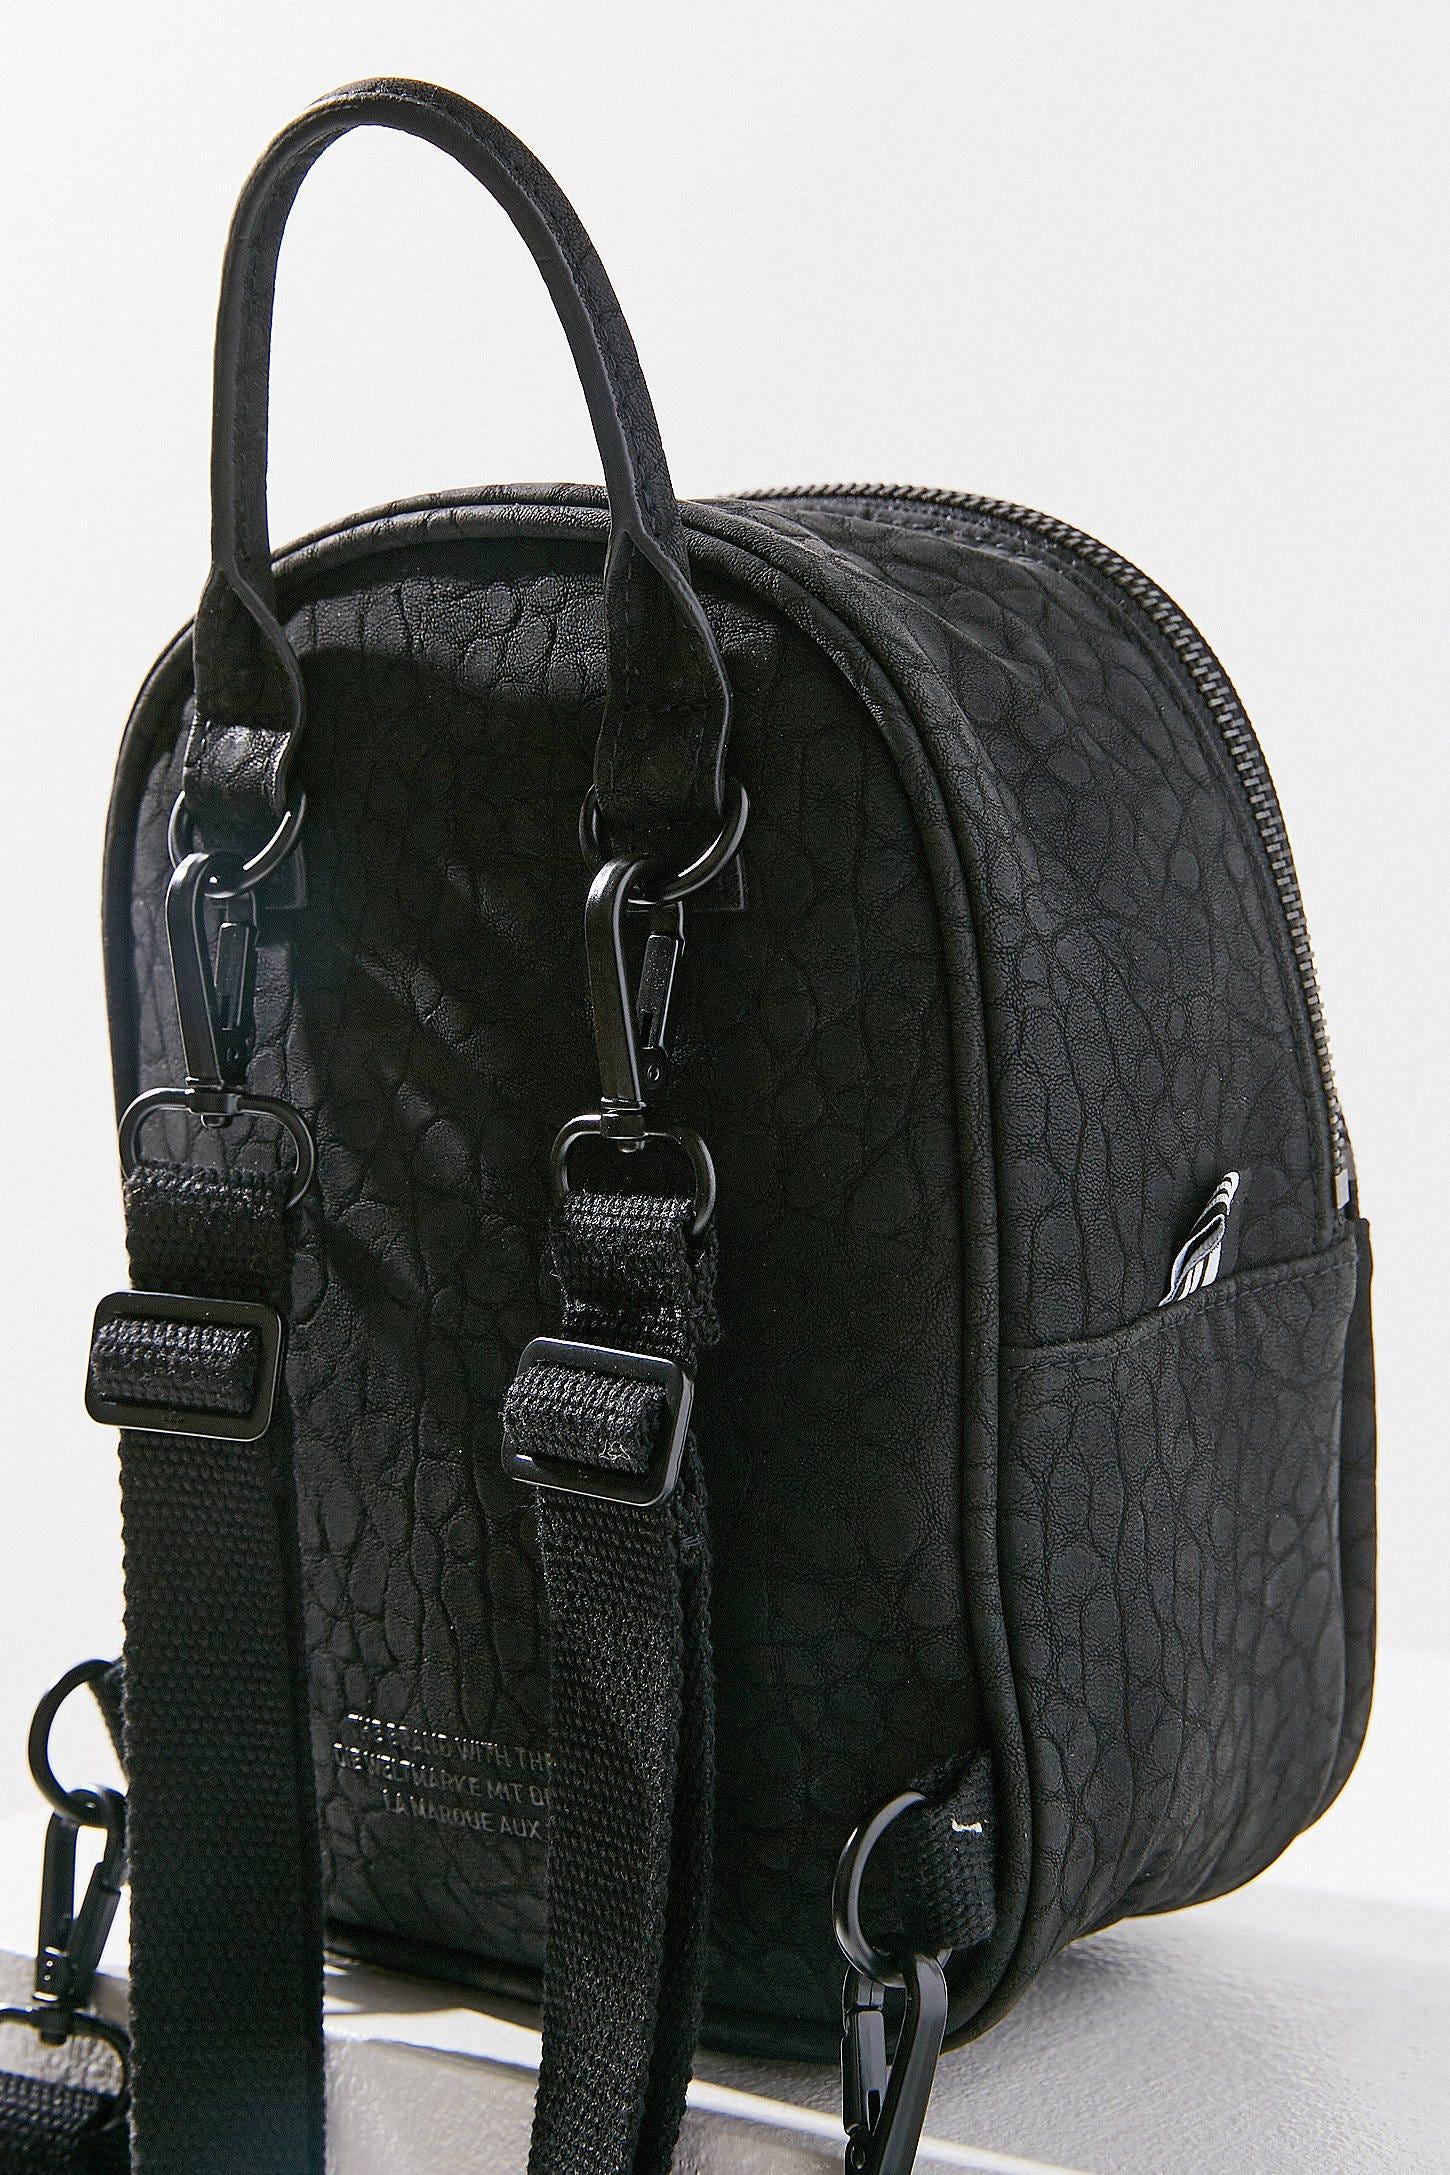 Adidas Originals Woman Faux Leather Backpack Black Size adidas vpwSGWqnr